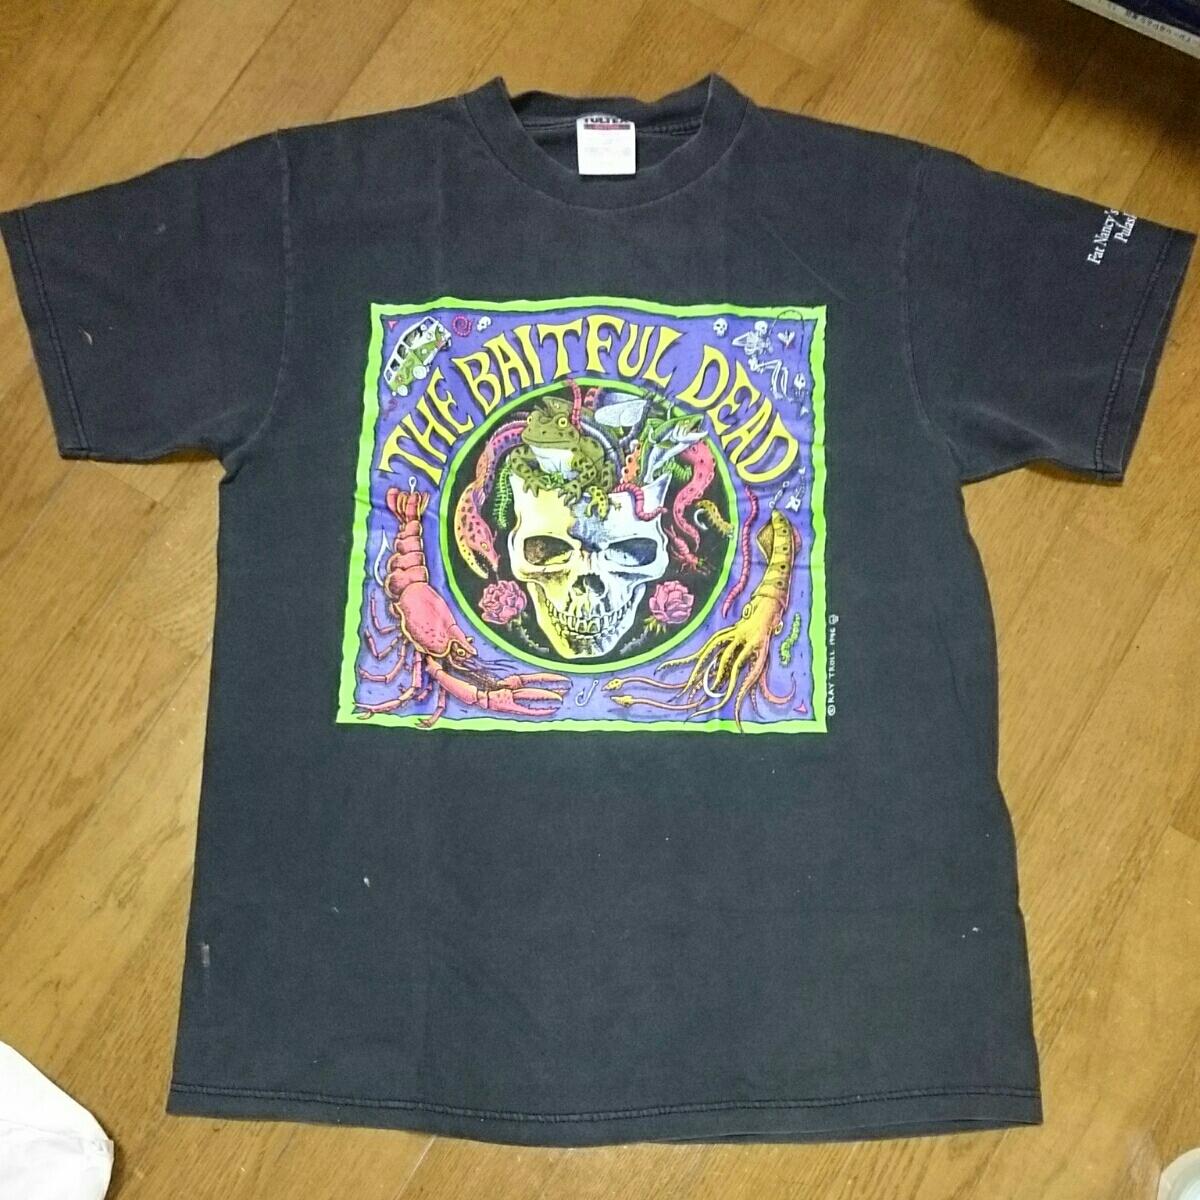 90s THE BAITFUL DEAD ヴィンテージ Tシャツ